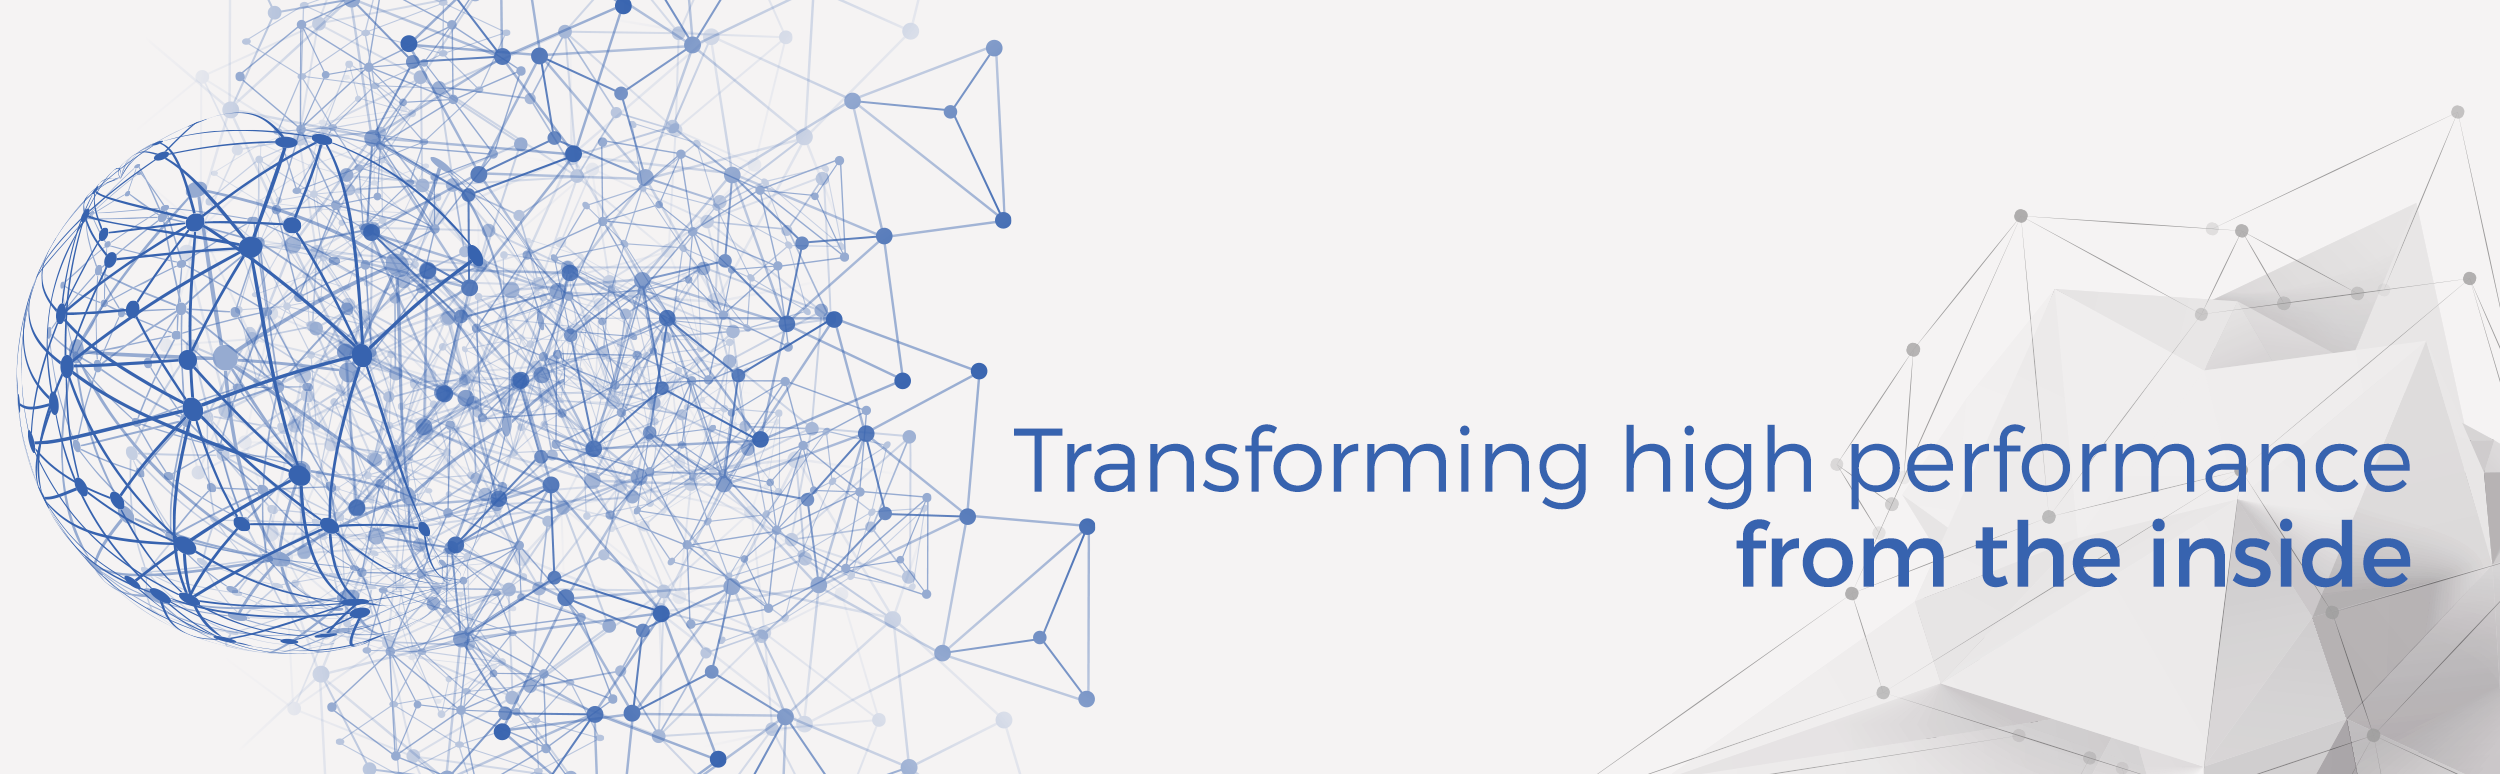 Banner 1 - Transforming HP.png